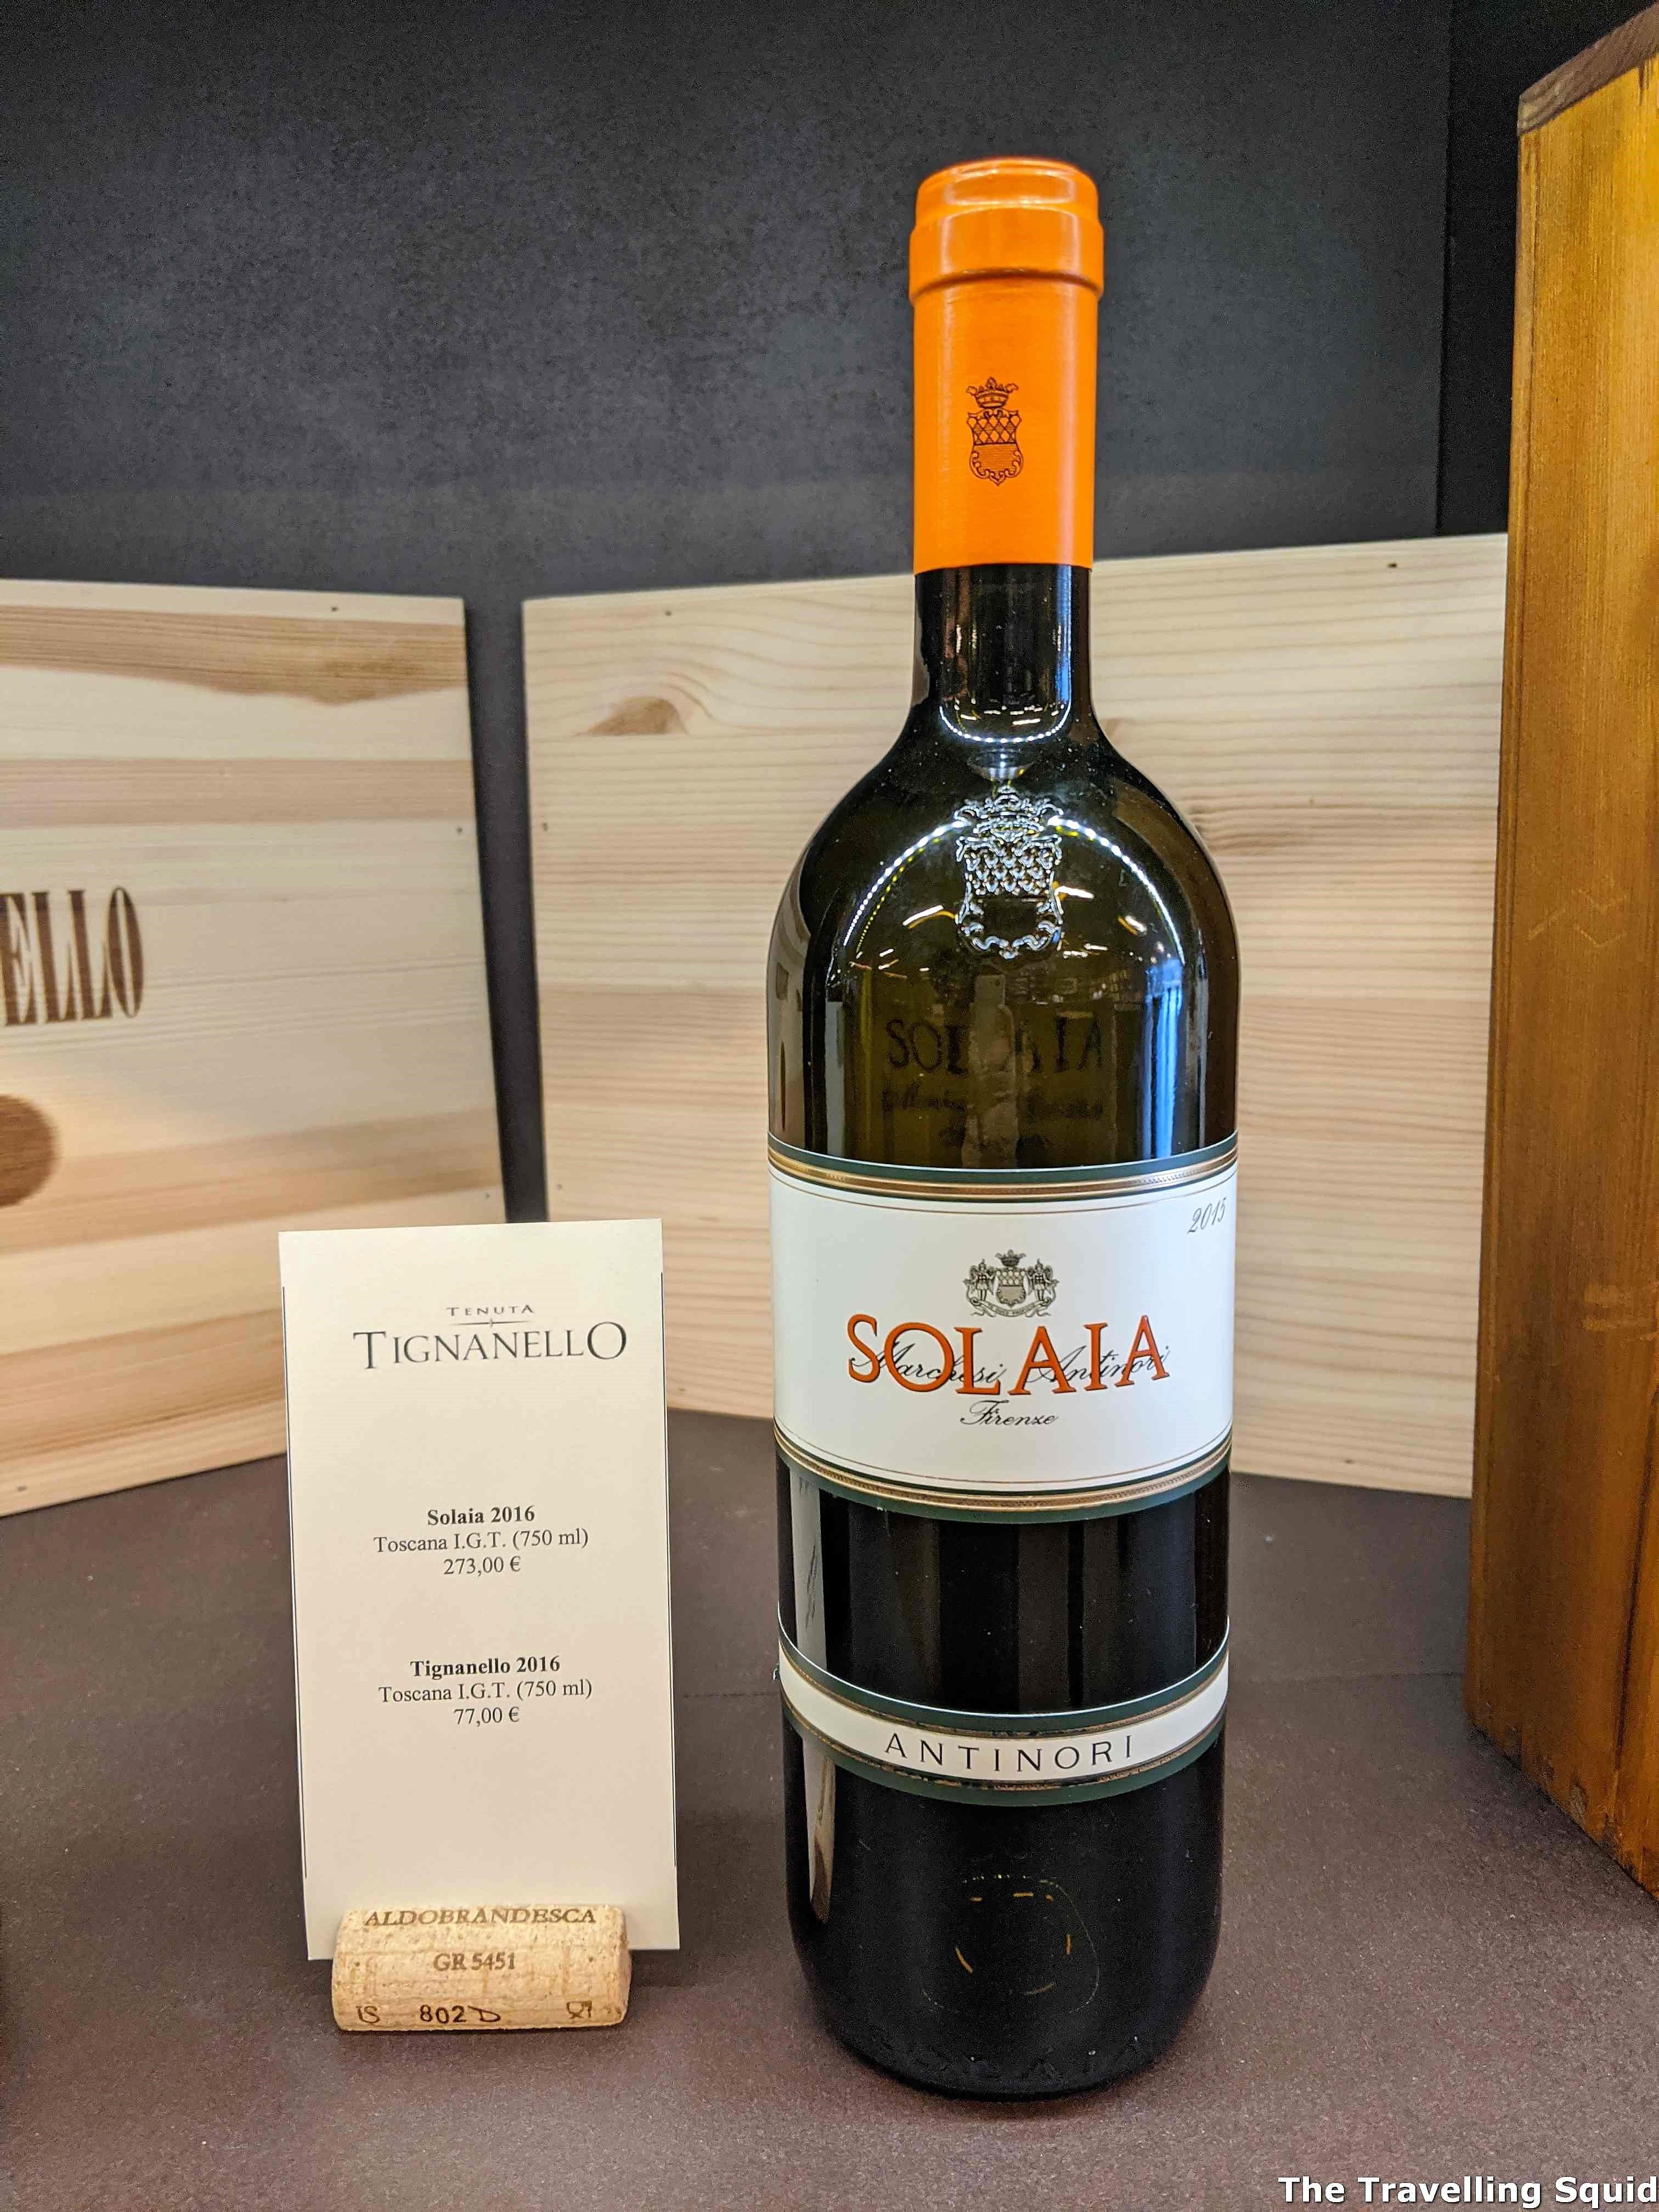 Solaia antinori super tuscan pioneer